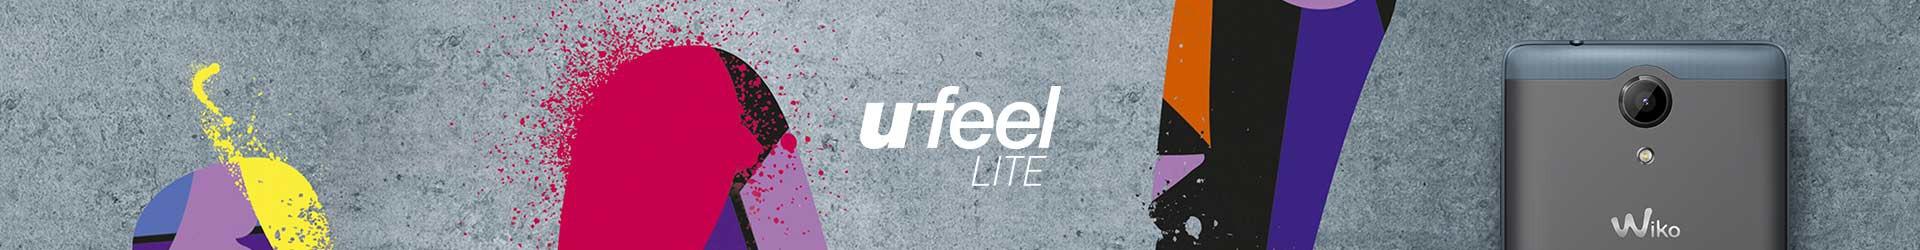 ufeel_lite